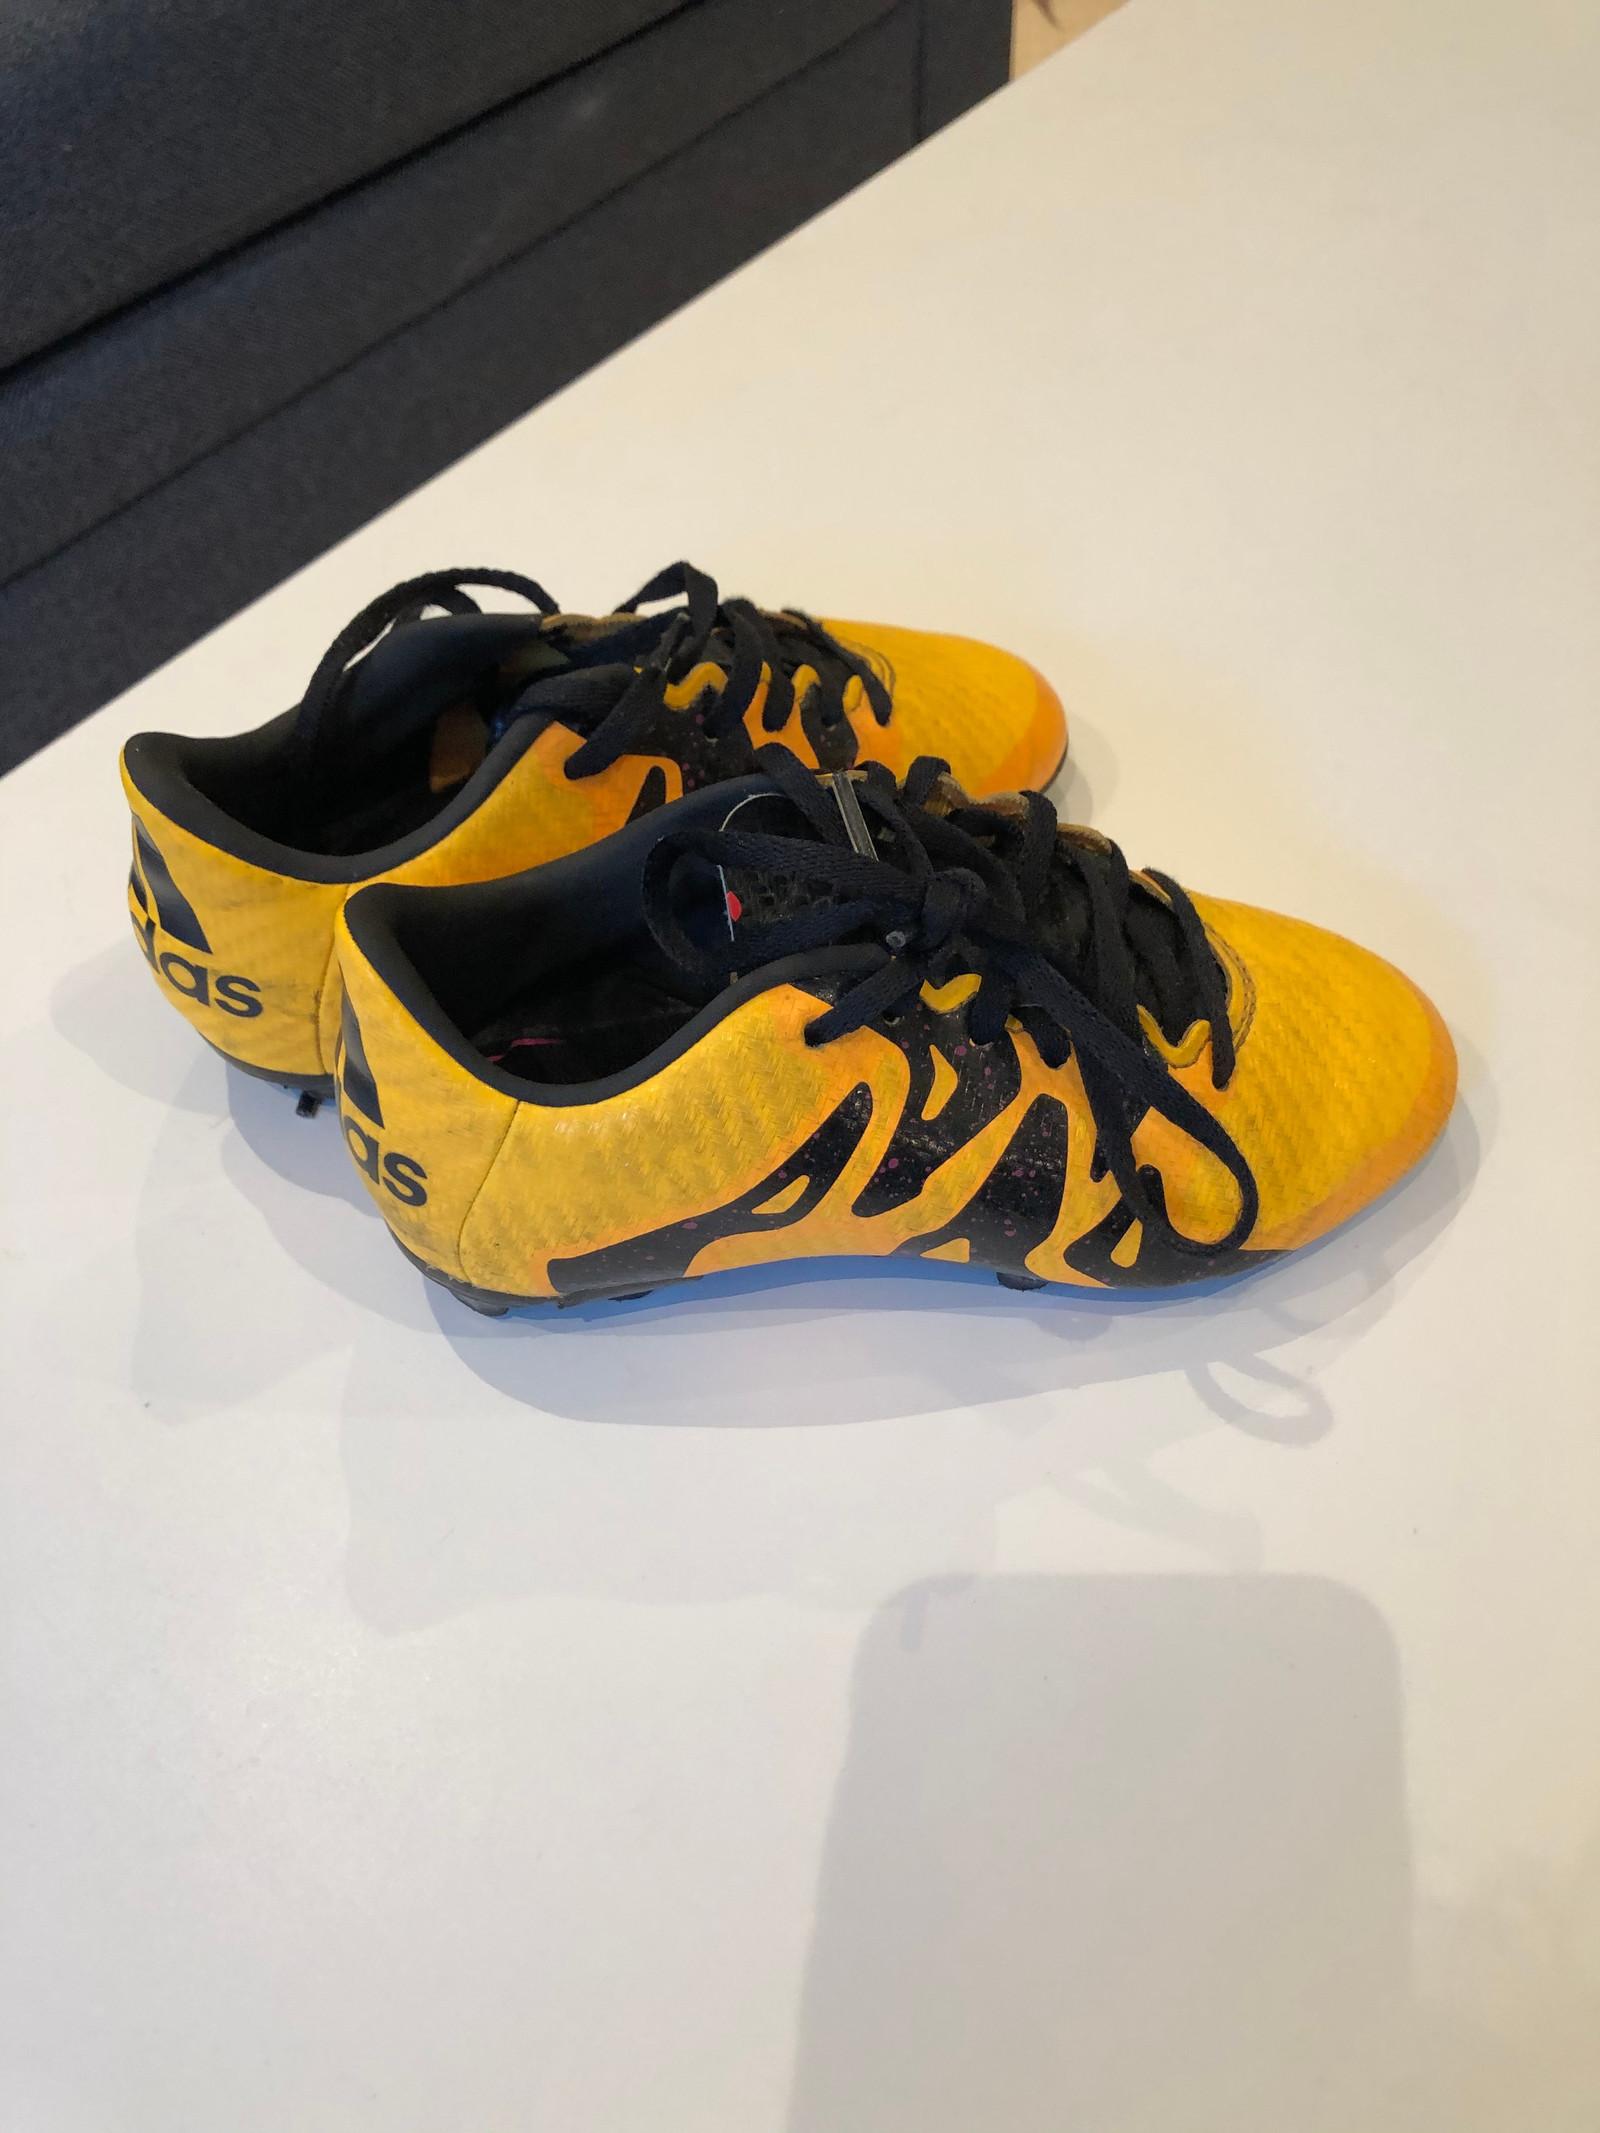 Sko til gutt, 28,5 31: Toms, Adidas, Kamik mm | FINN.no